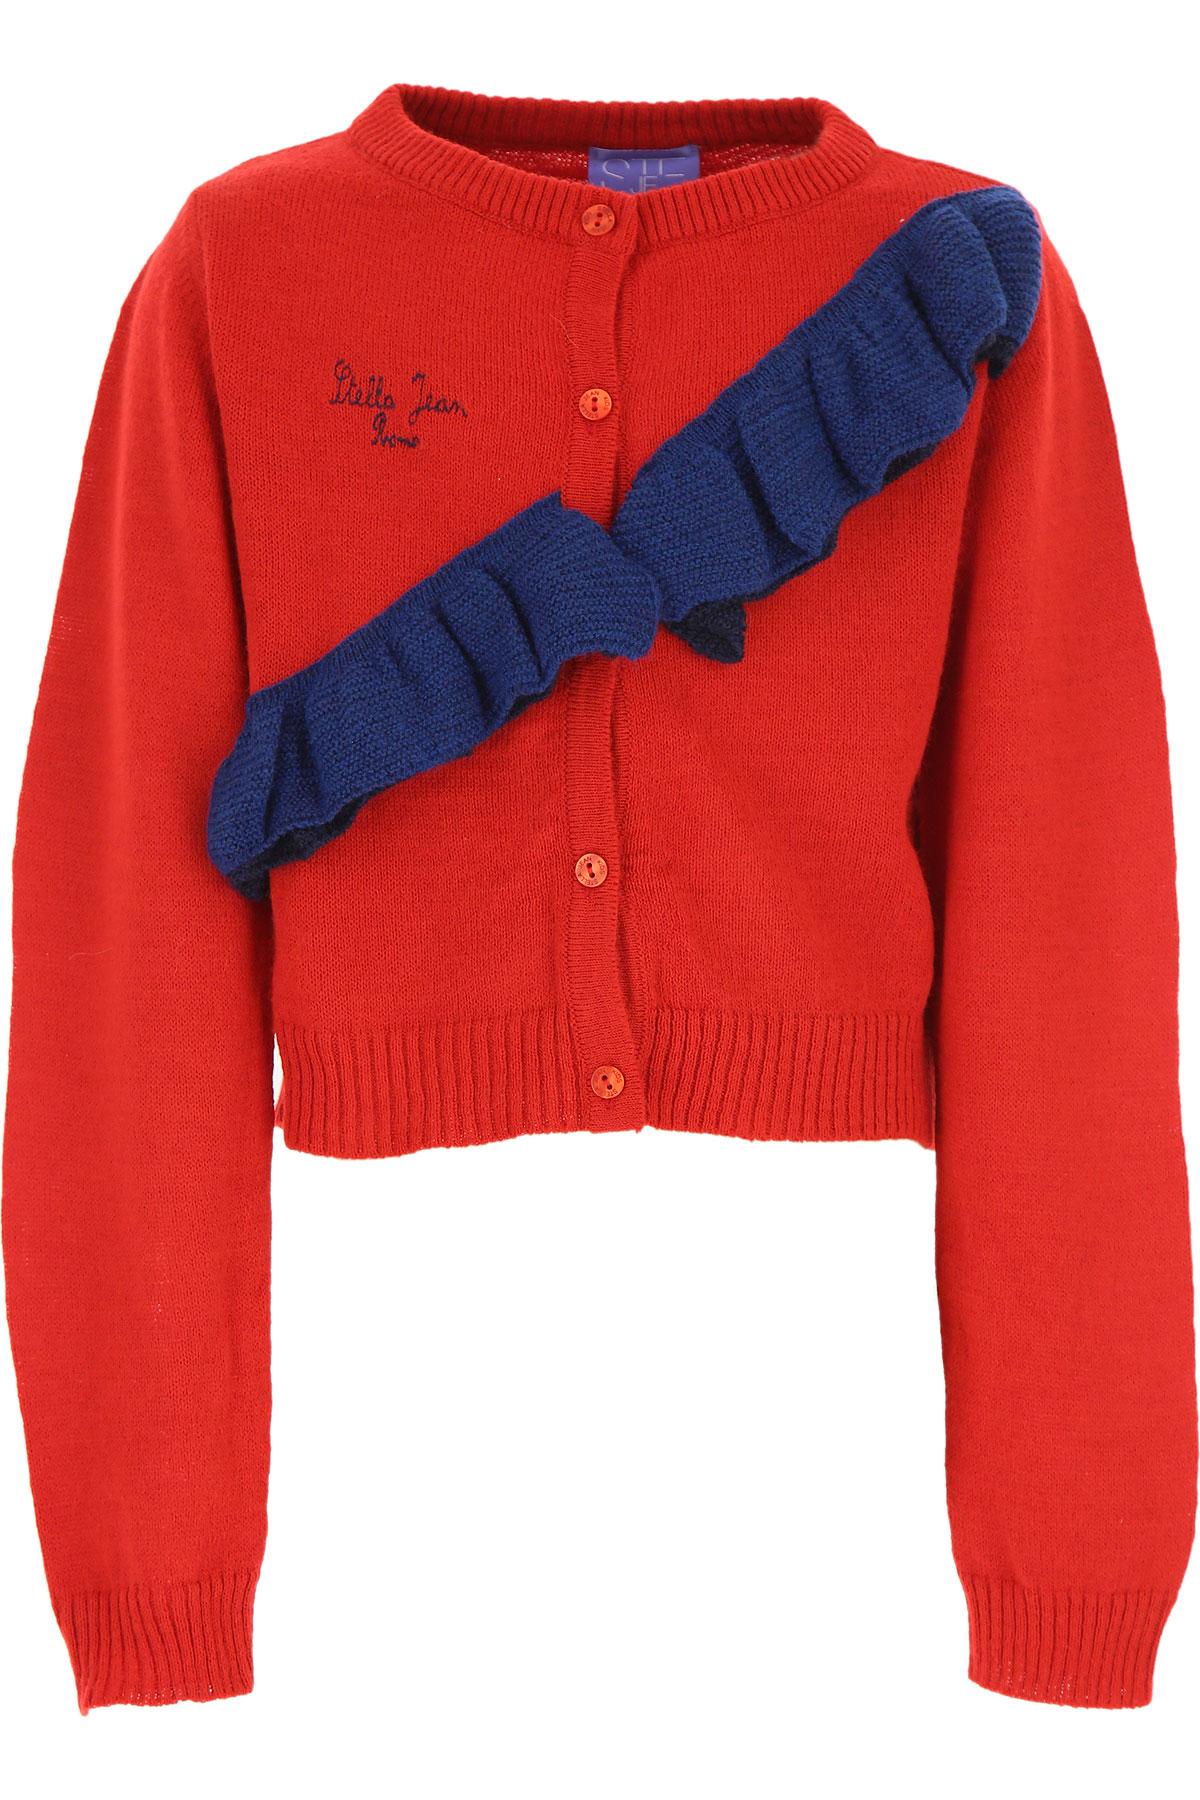 Stella Jean Kids Sweaters for Girls On Sale, Red, Acrylic, 2019, 10Y 4Y 6Y 8Y